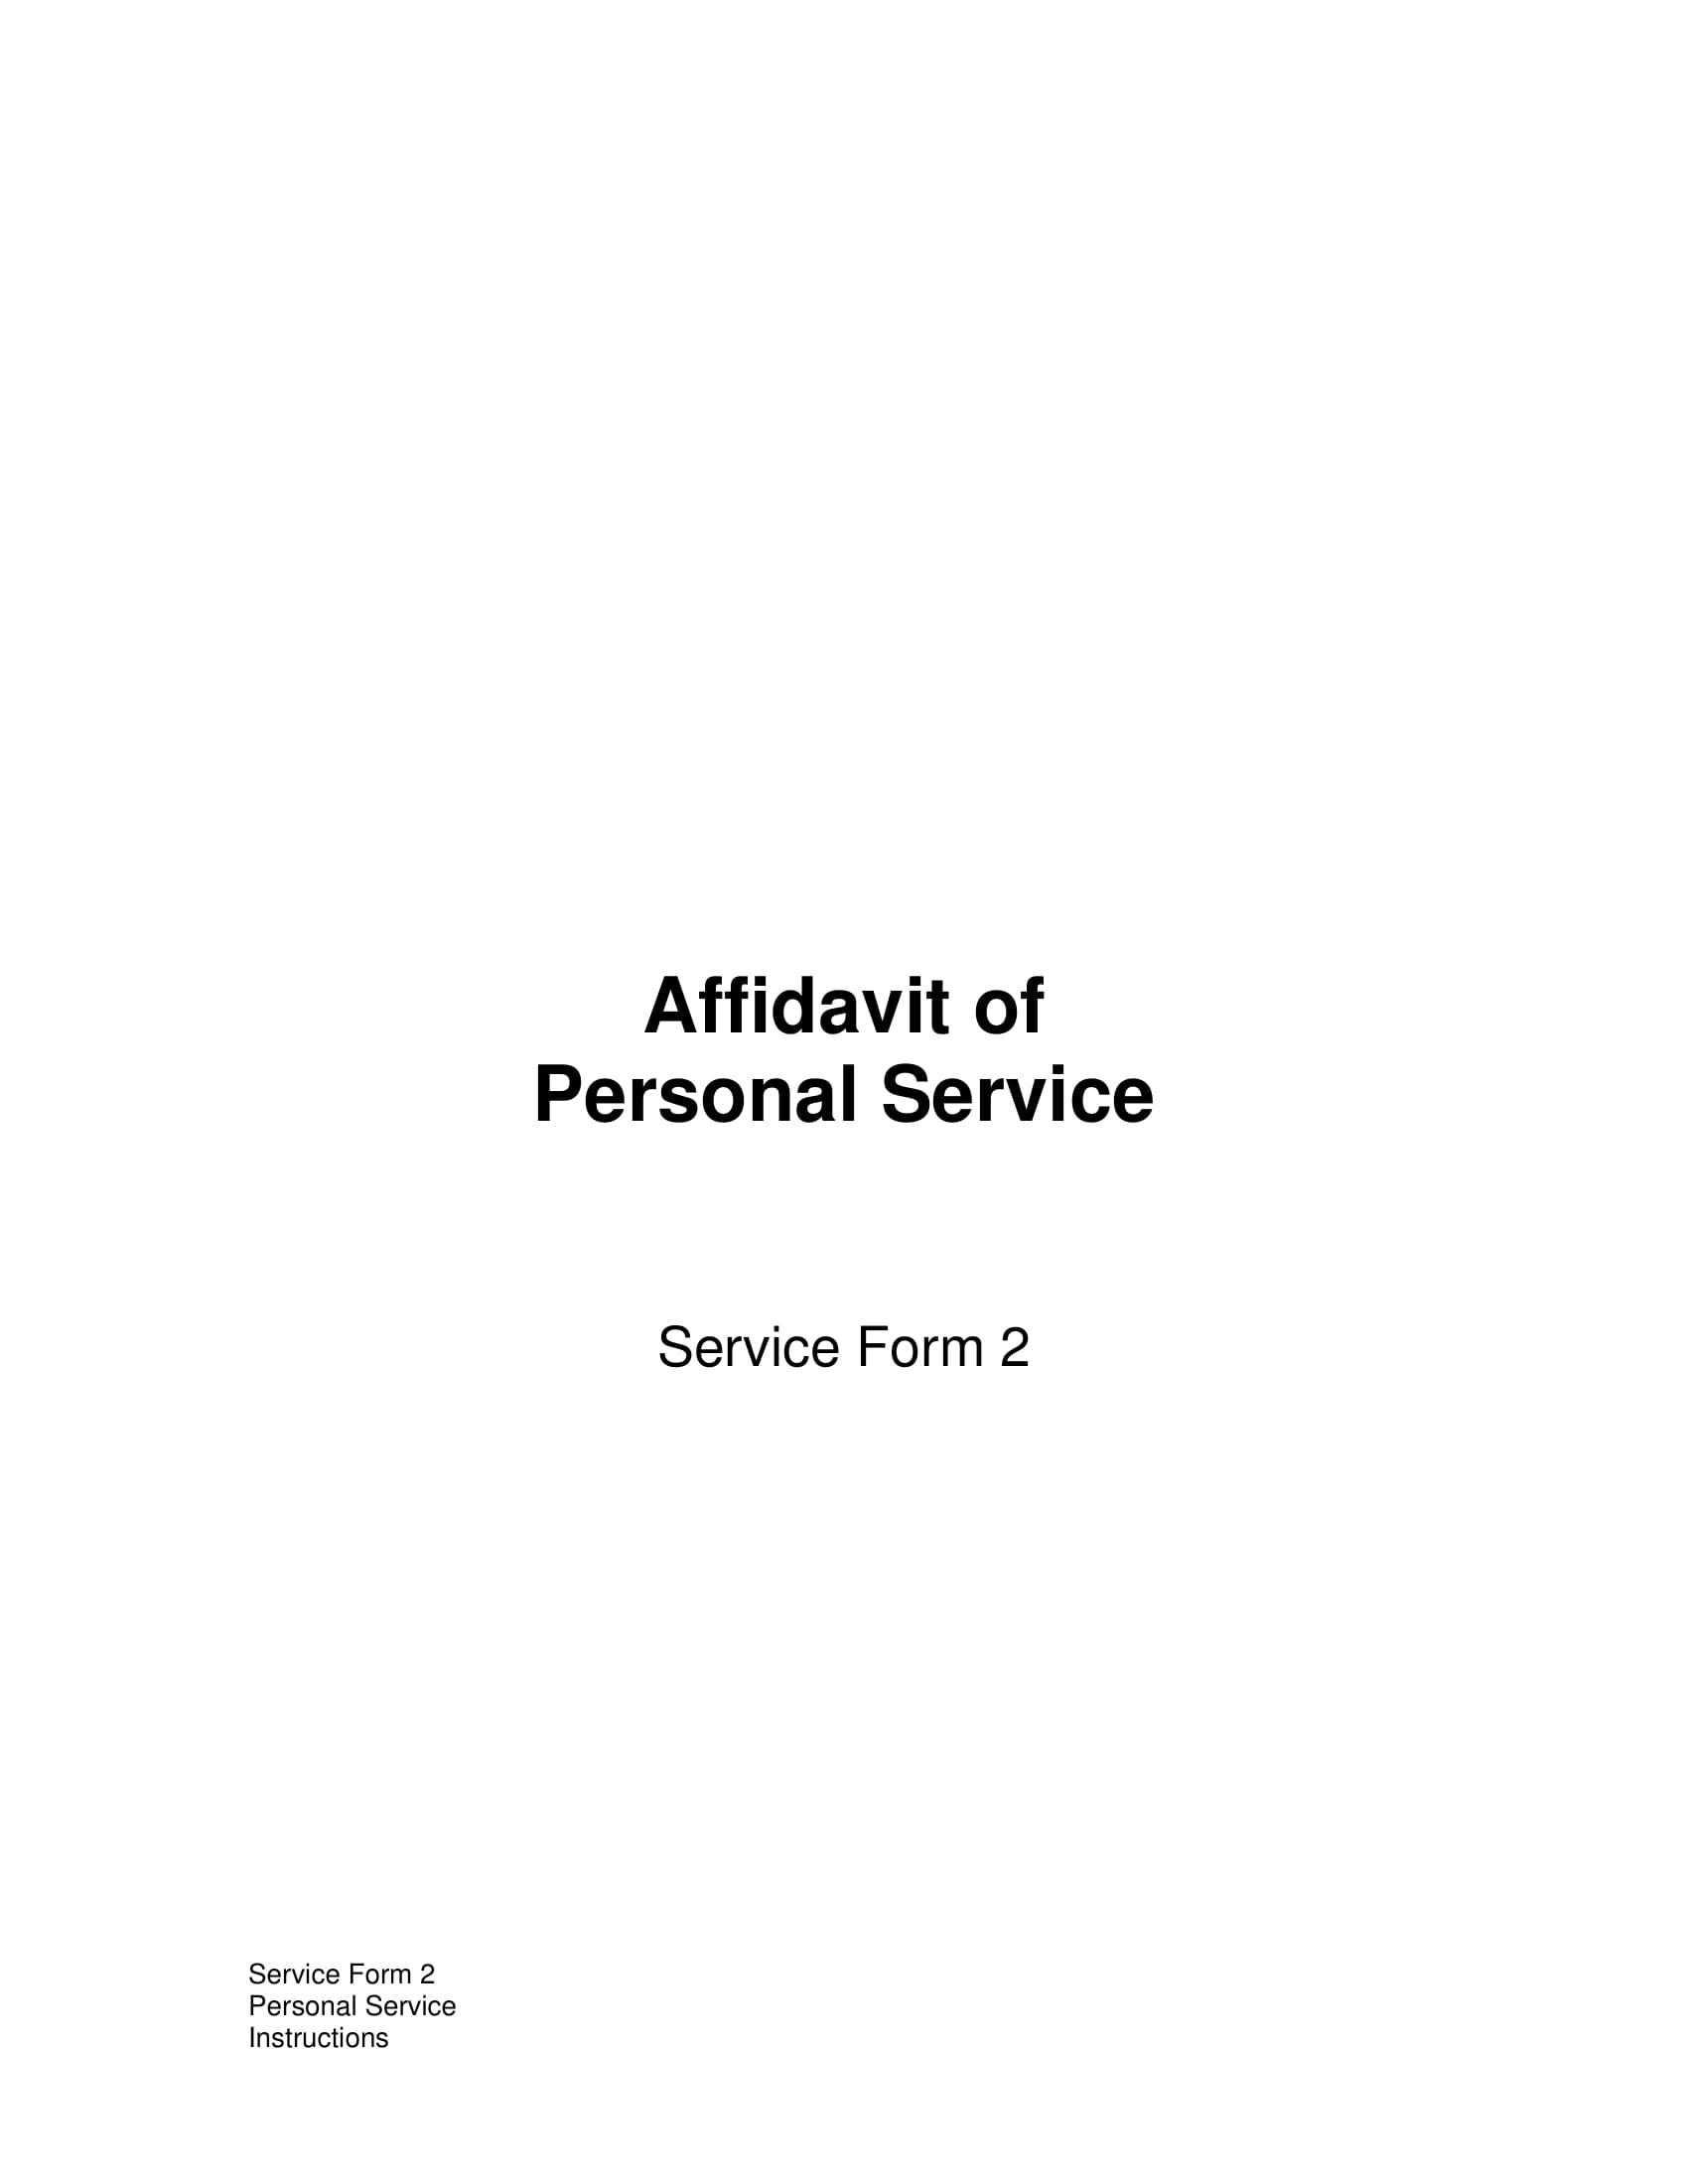 affidavit of personal service